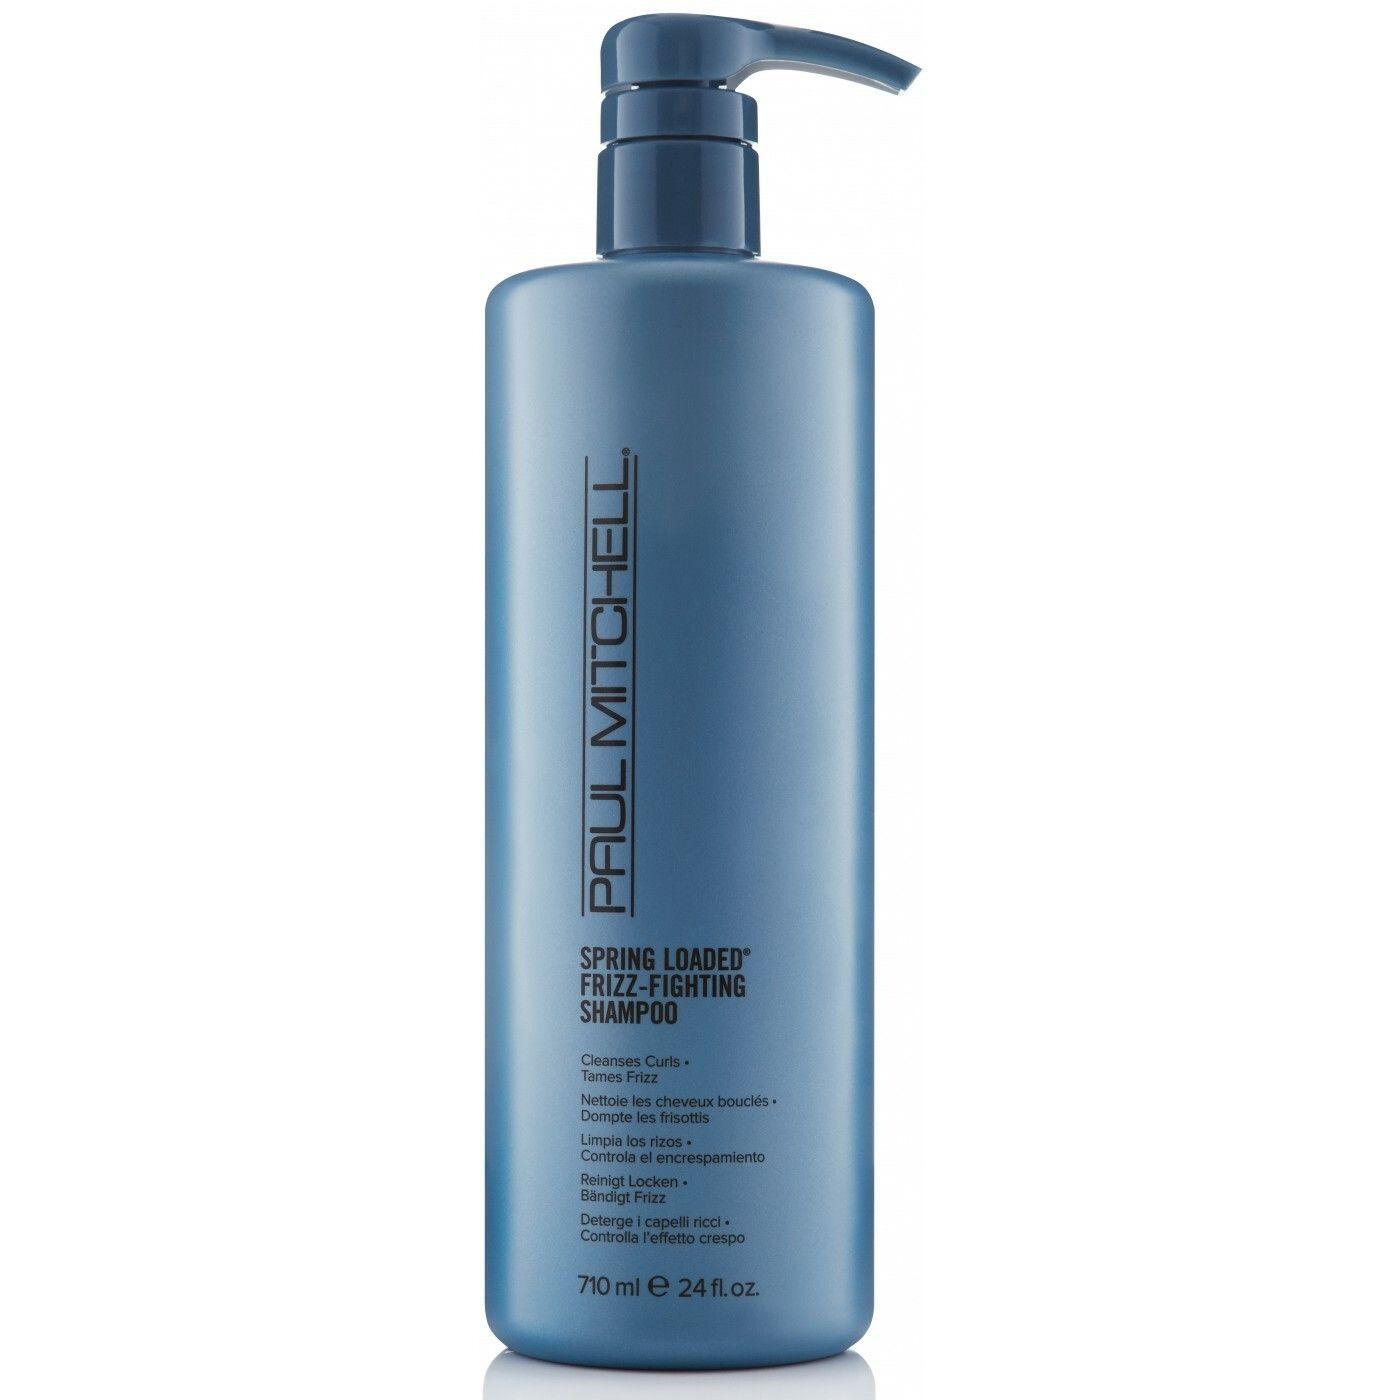 Paul Mitchell Curls Spring Loaded Frizz-fighting Shampoo - 710ml